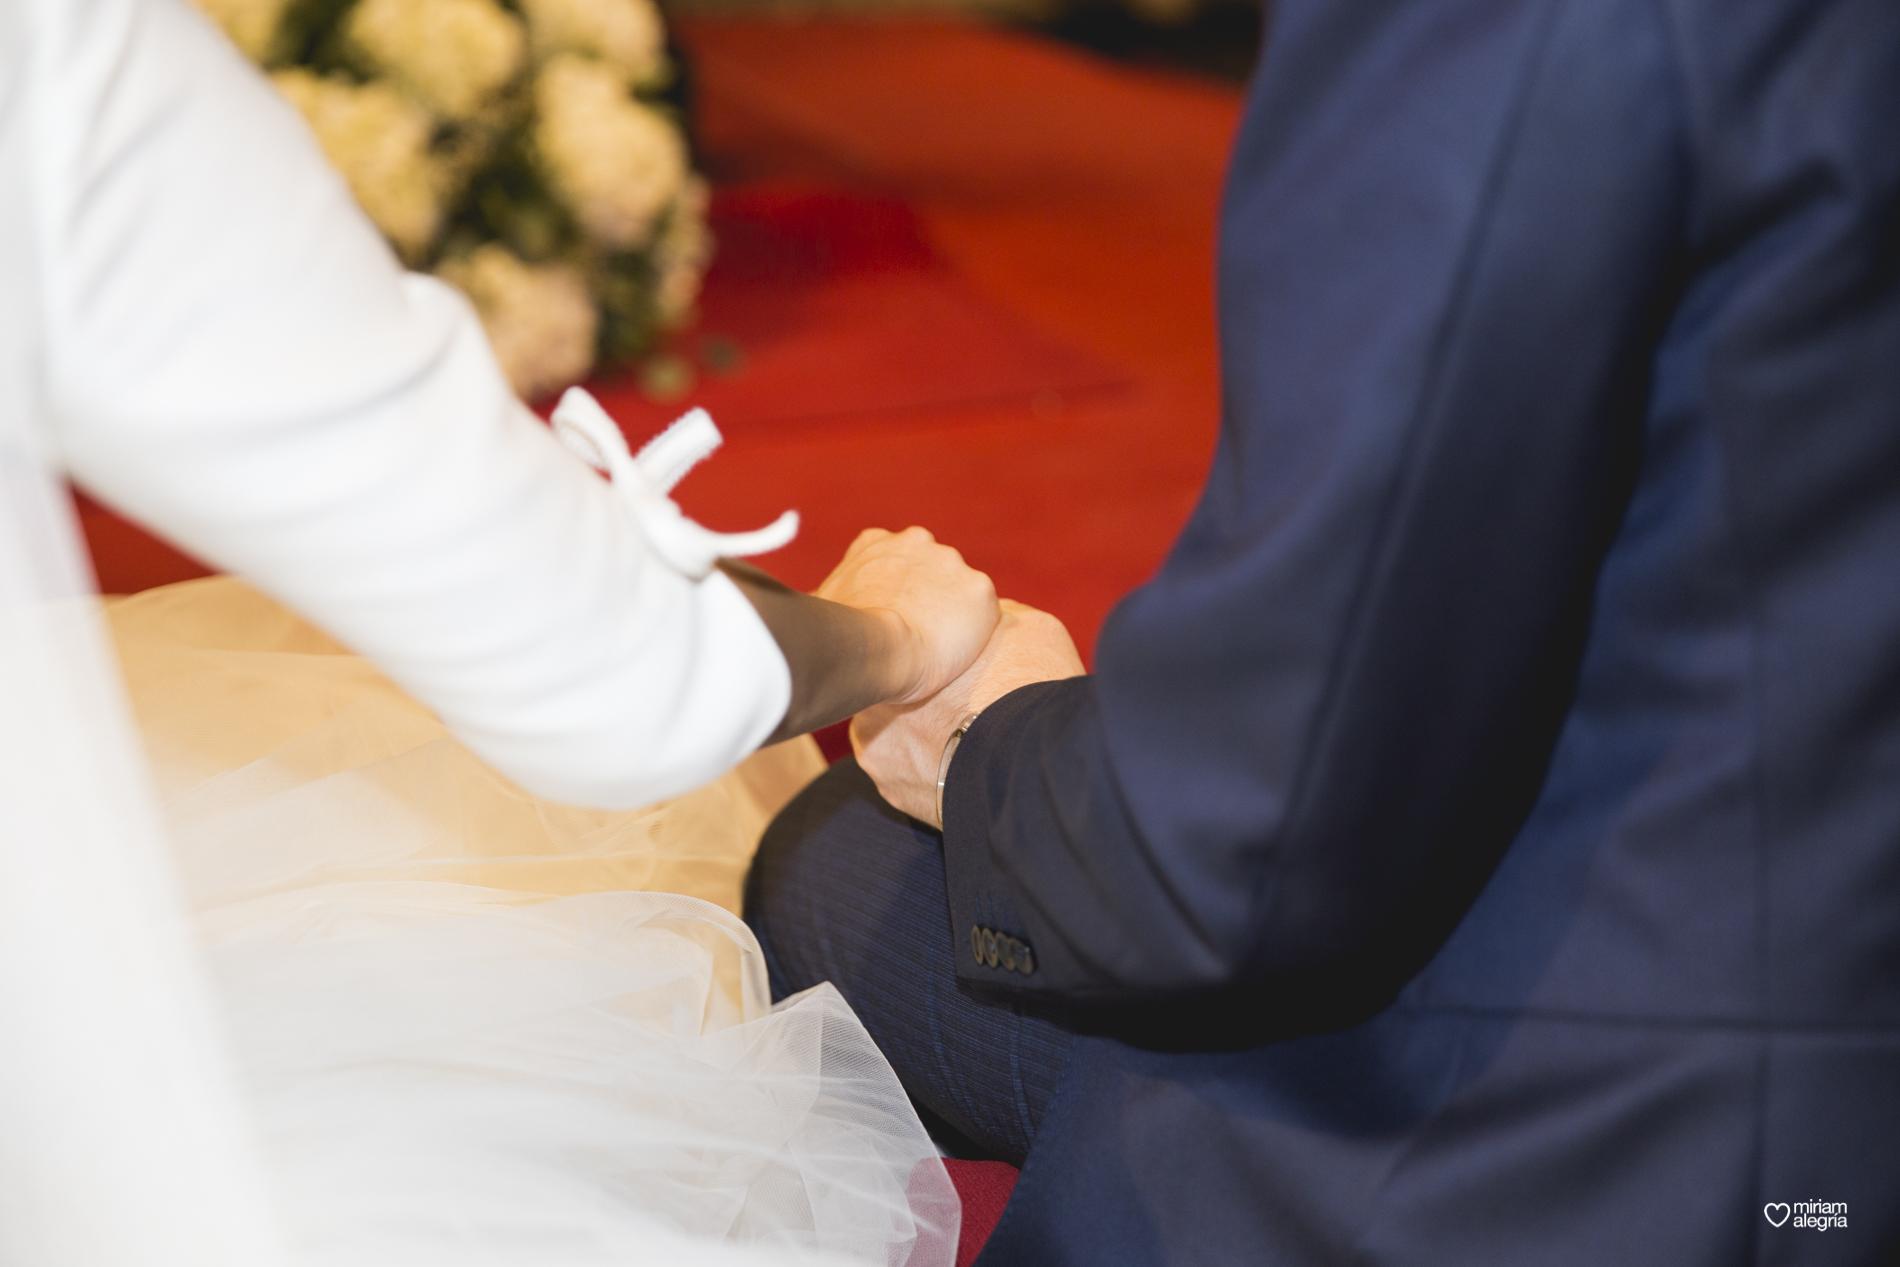 boda-en-la-catedral-de-murcia-miriam-alegria-fotografos-boda-murcia-49